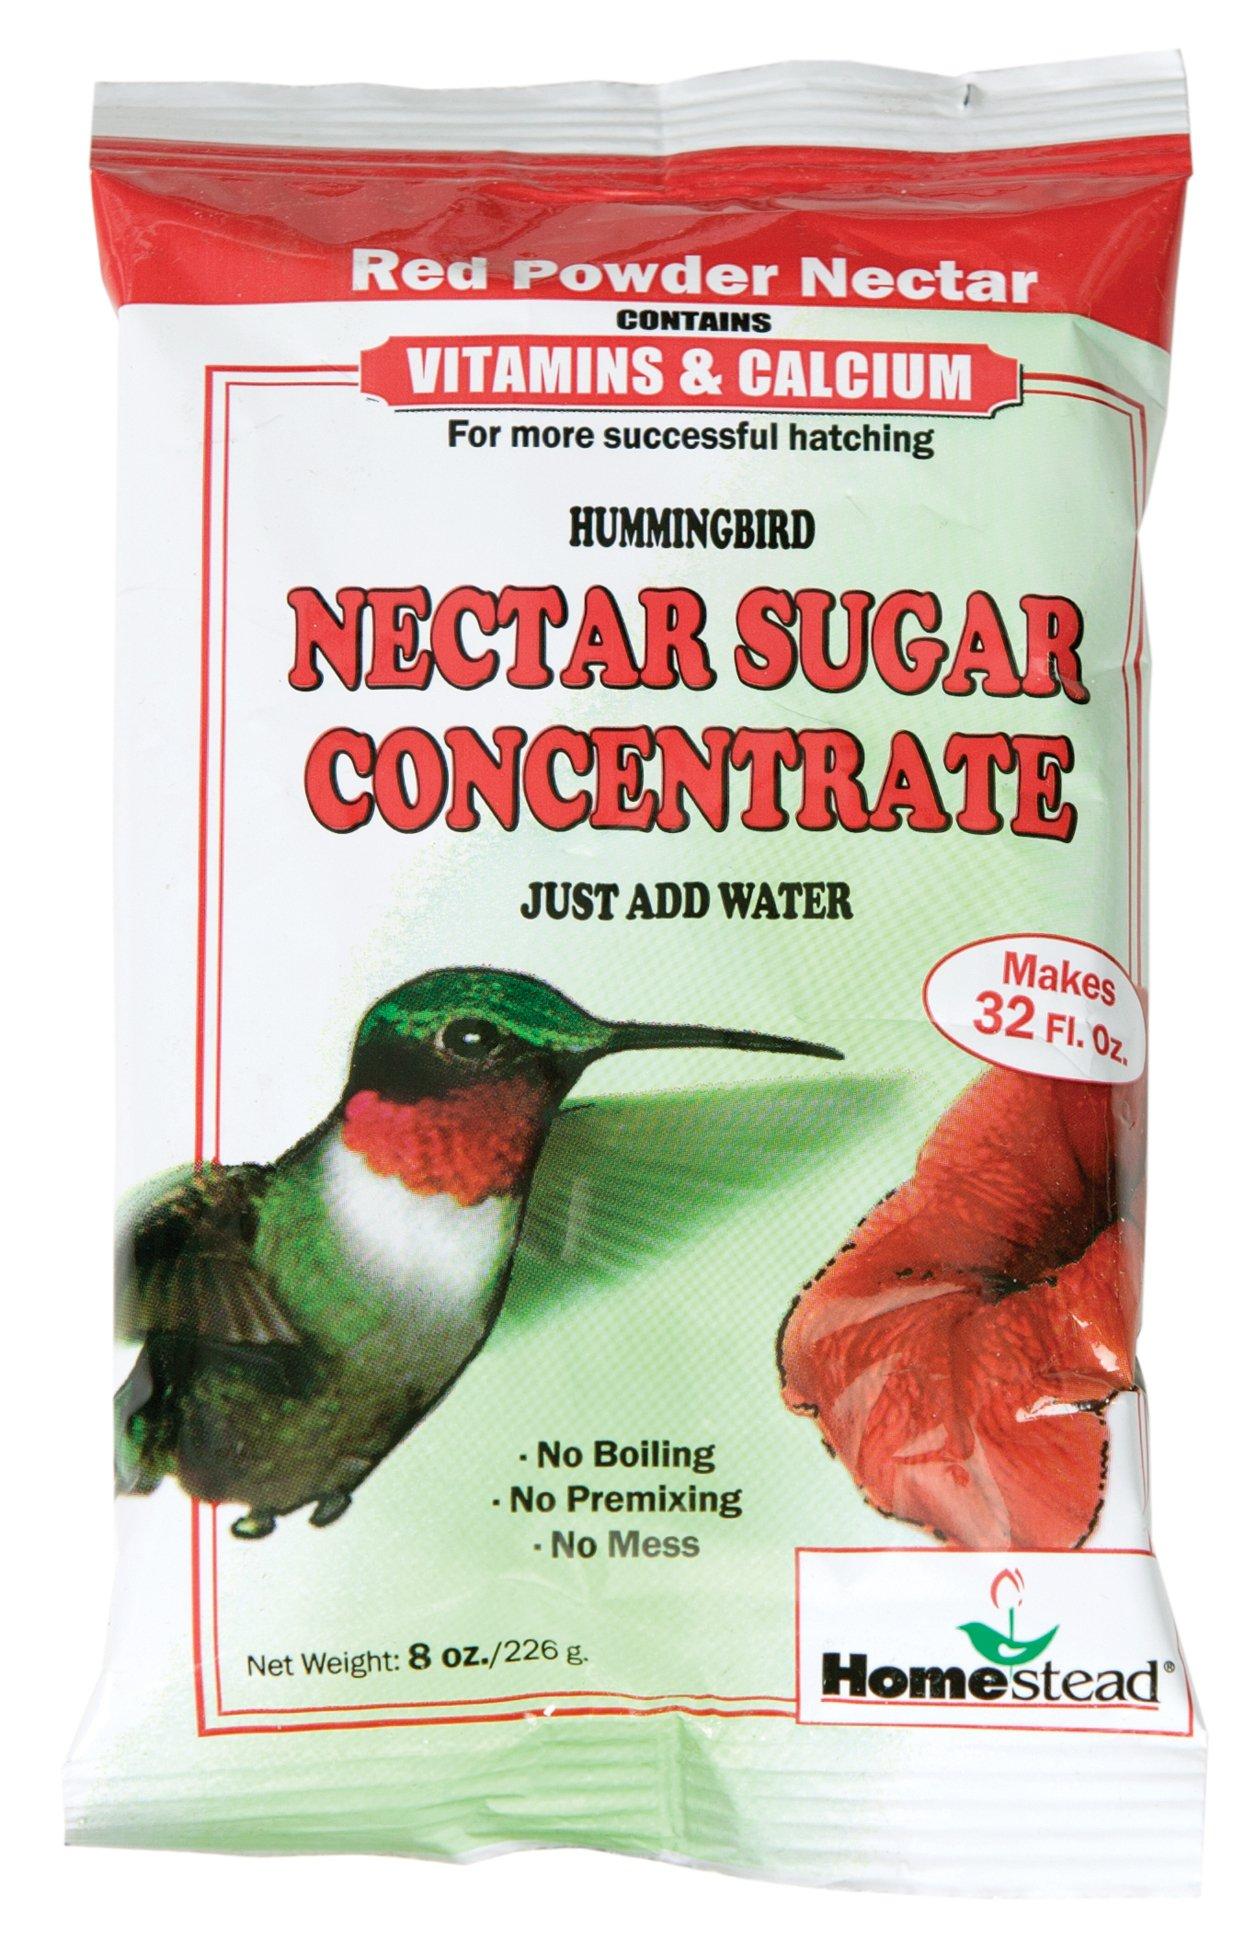 Homestead 8 oz Hummingbird Red Nectar Sugar Concentrate (Powder) - 4305